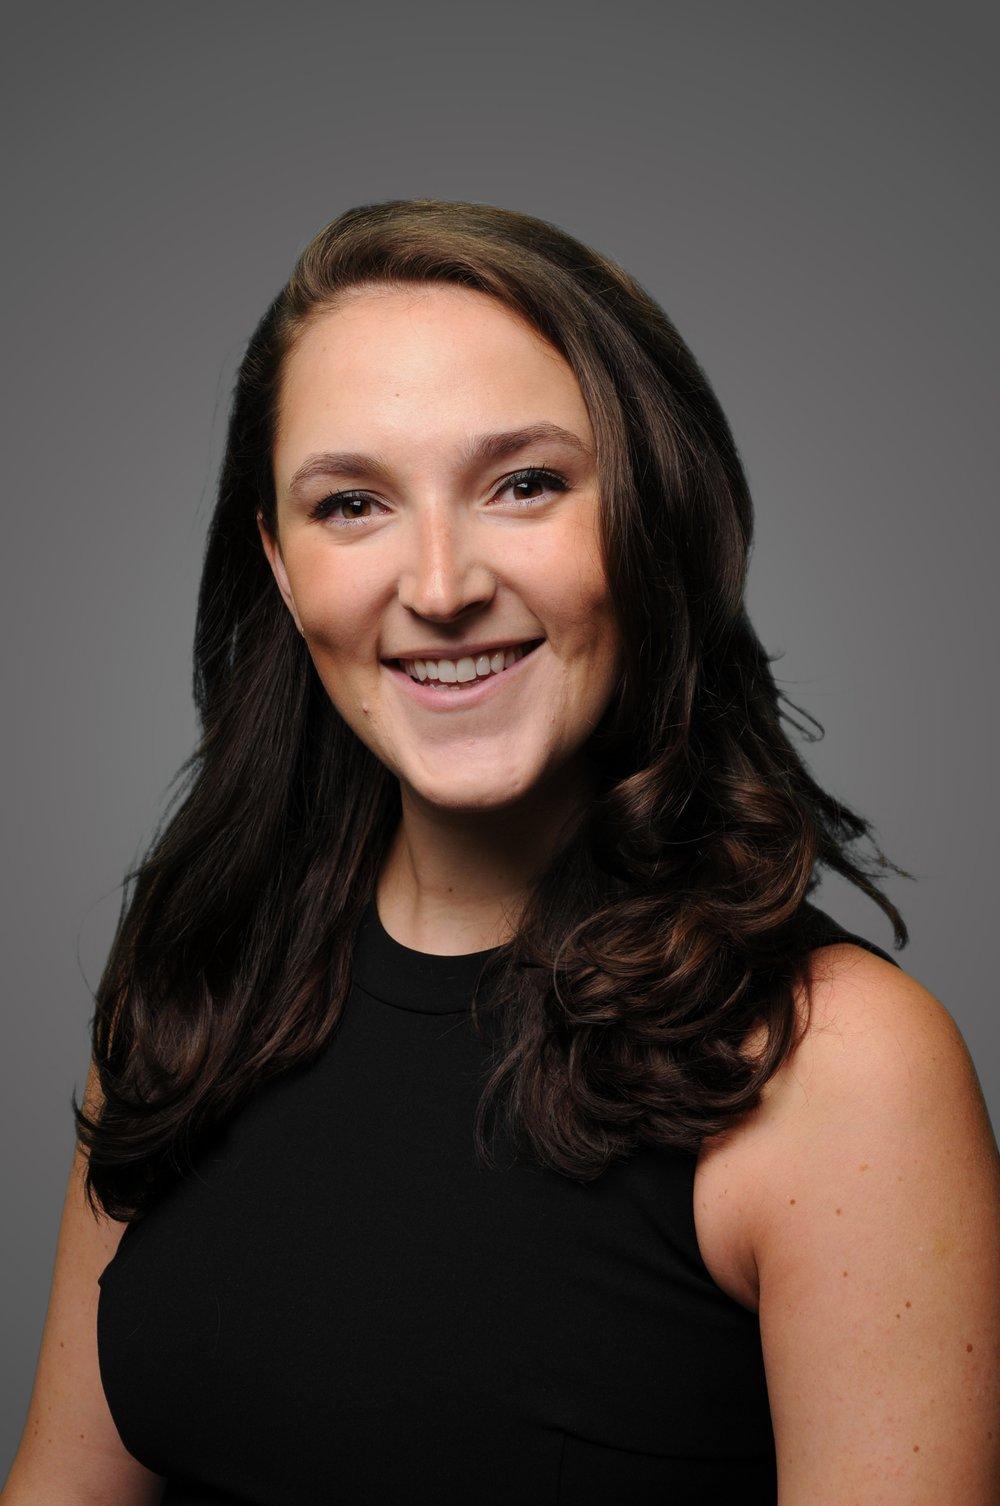 Alyssa Smith   VP of Corporate Relations- Finance  ajs1322@stern.nyu.edu